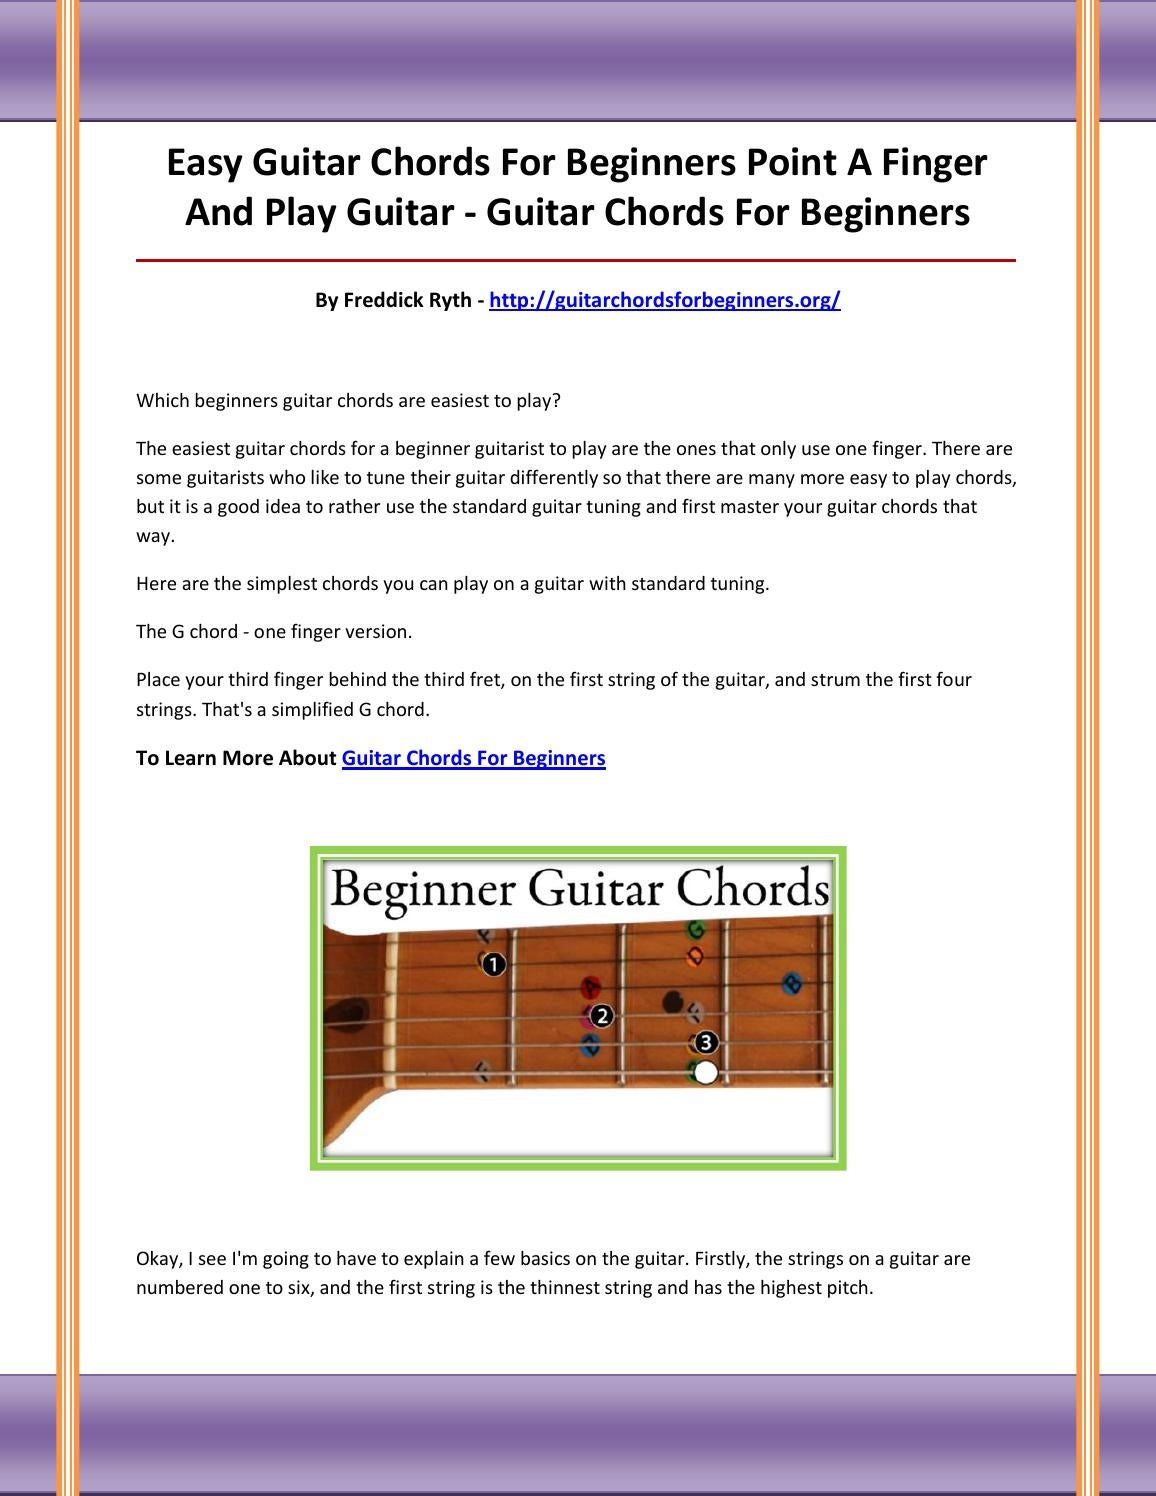 Guitar Chords For Beginners By Asddfgfgfa Issuu